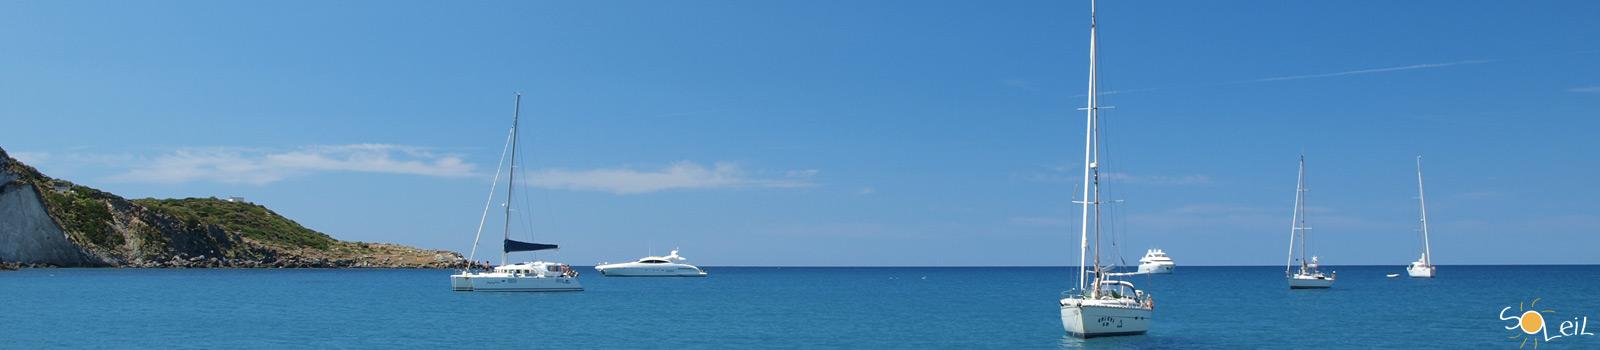 vacanze in barca a vela crociere estive